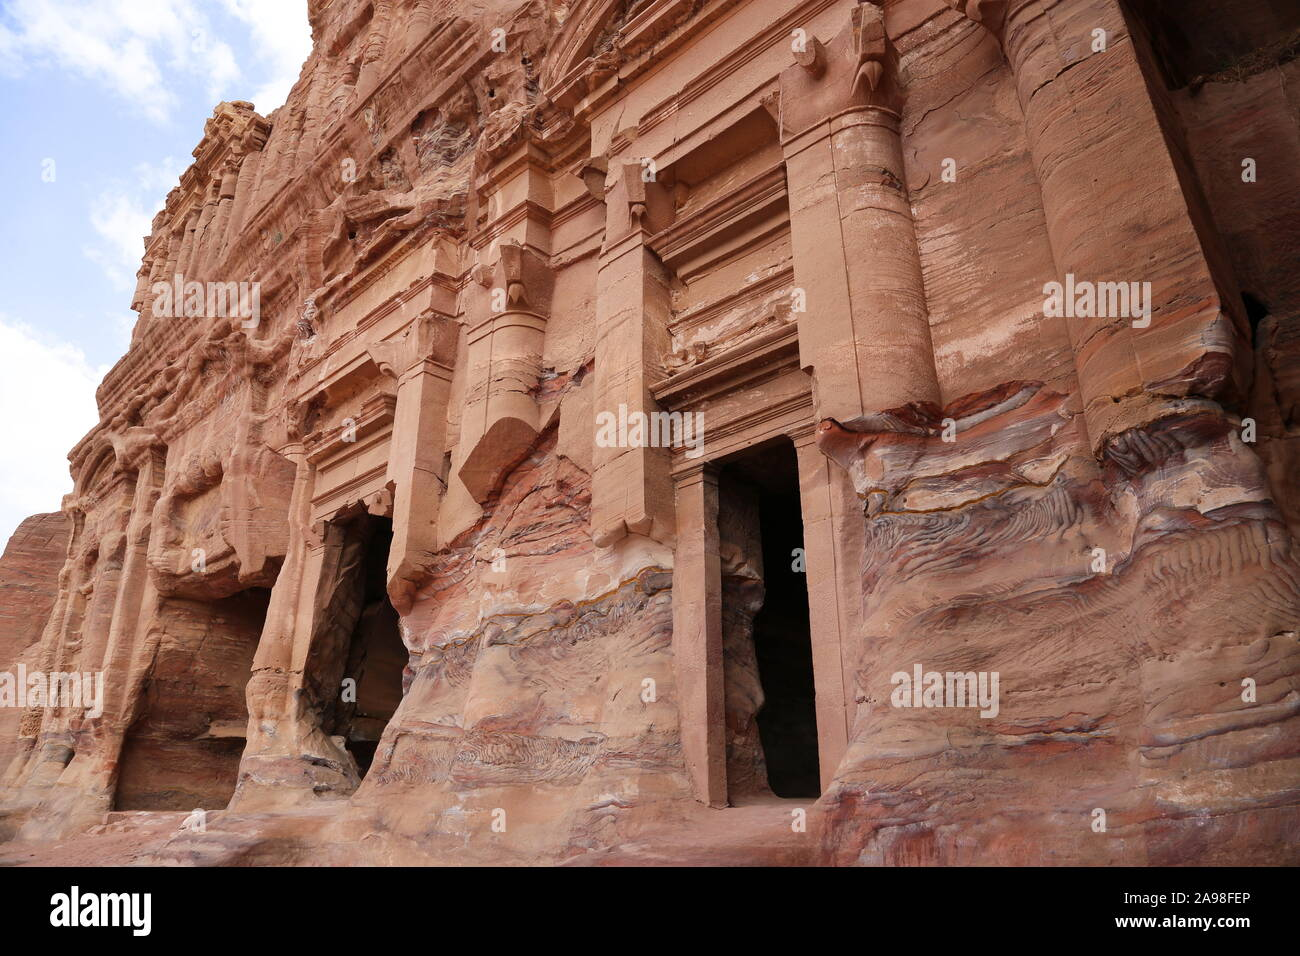 Palace Tomb (Qabr Al Qasr), Royal Tombs, Treasury Viewpoint Trail, Petra, Wadi Musa, Ma'an Governorate, Jordan, Middle East Stock Photo